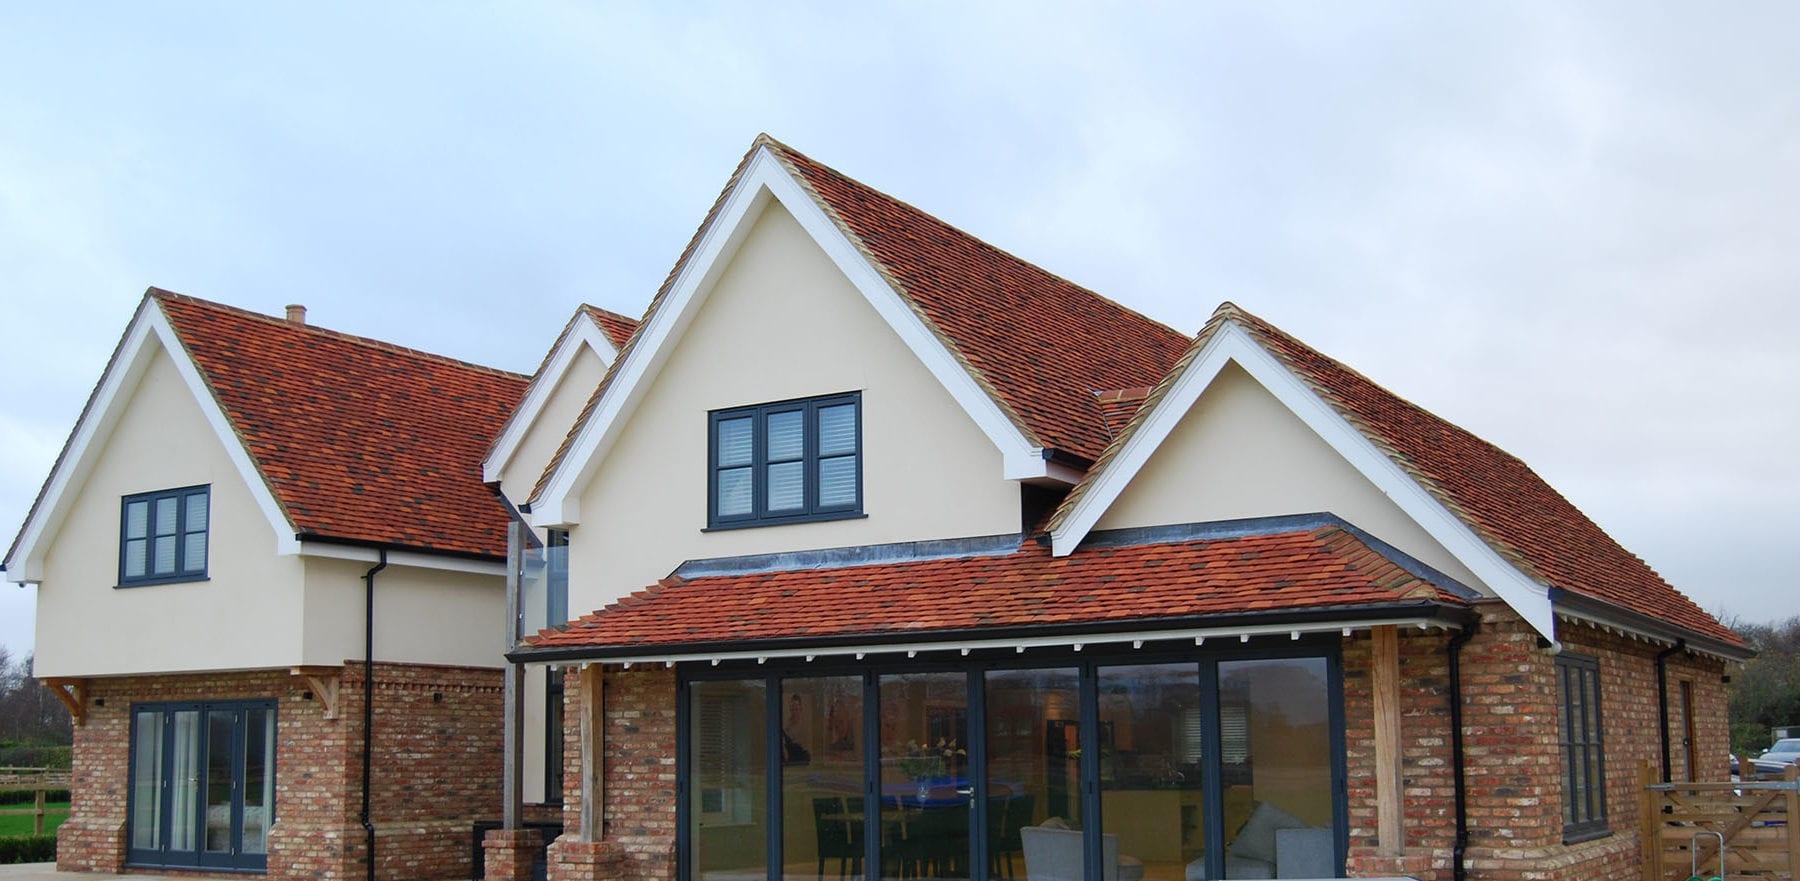 Lifestiles - Handmade Multi Clay Roof Tiles - Nazing, England 6